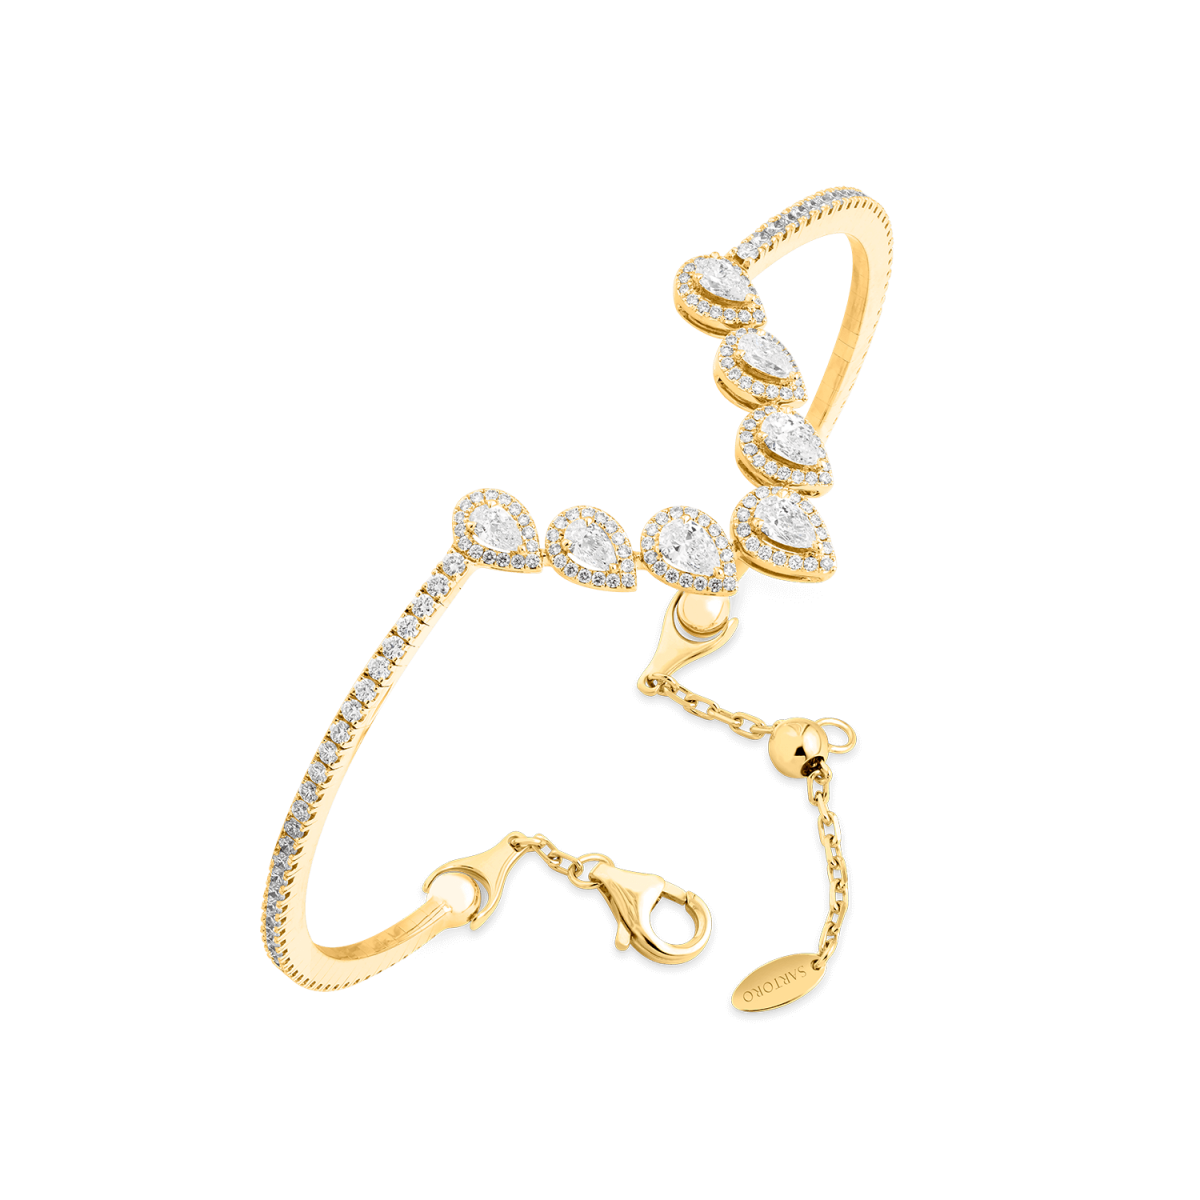 Ariana yellow gold bangle with diamonds